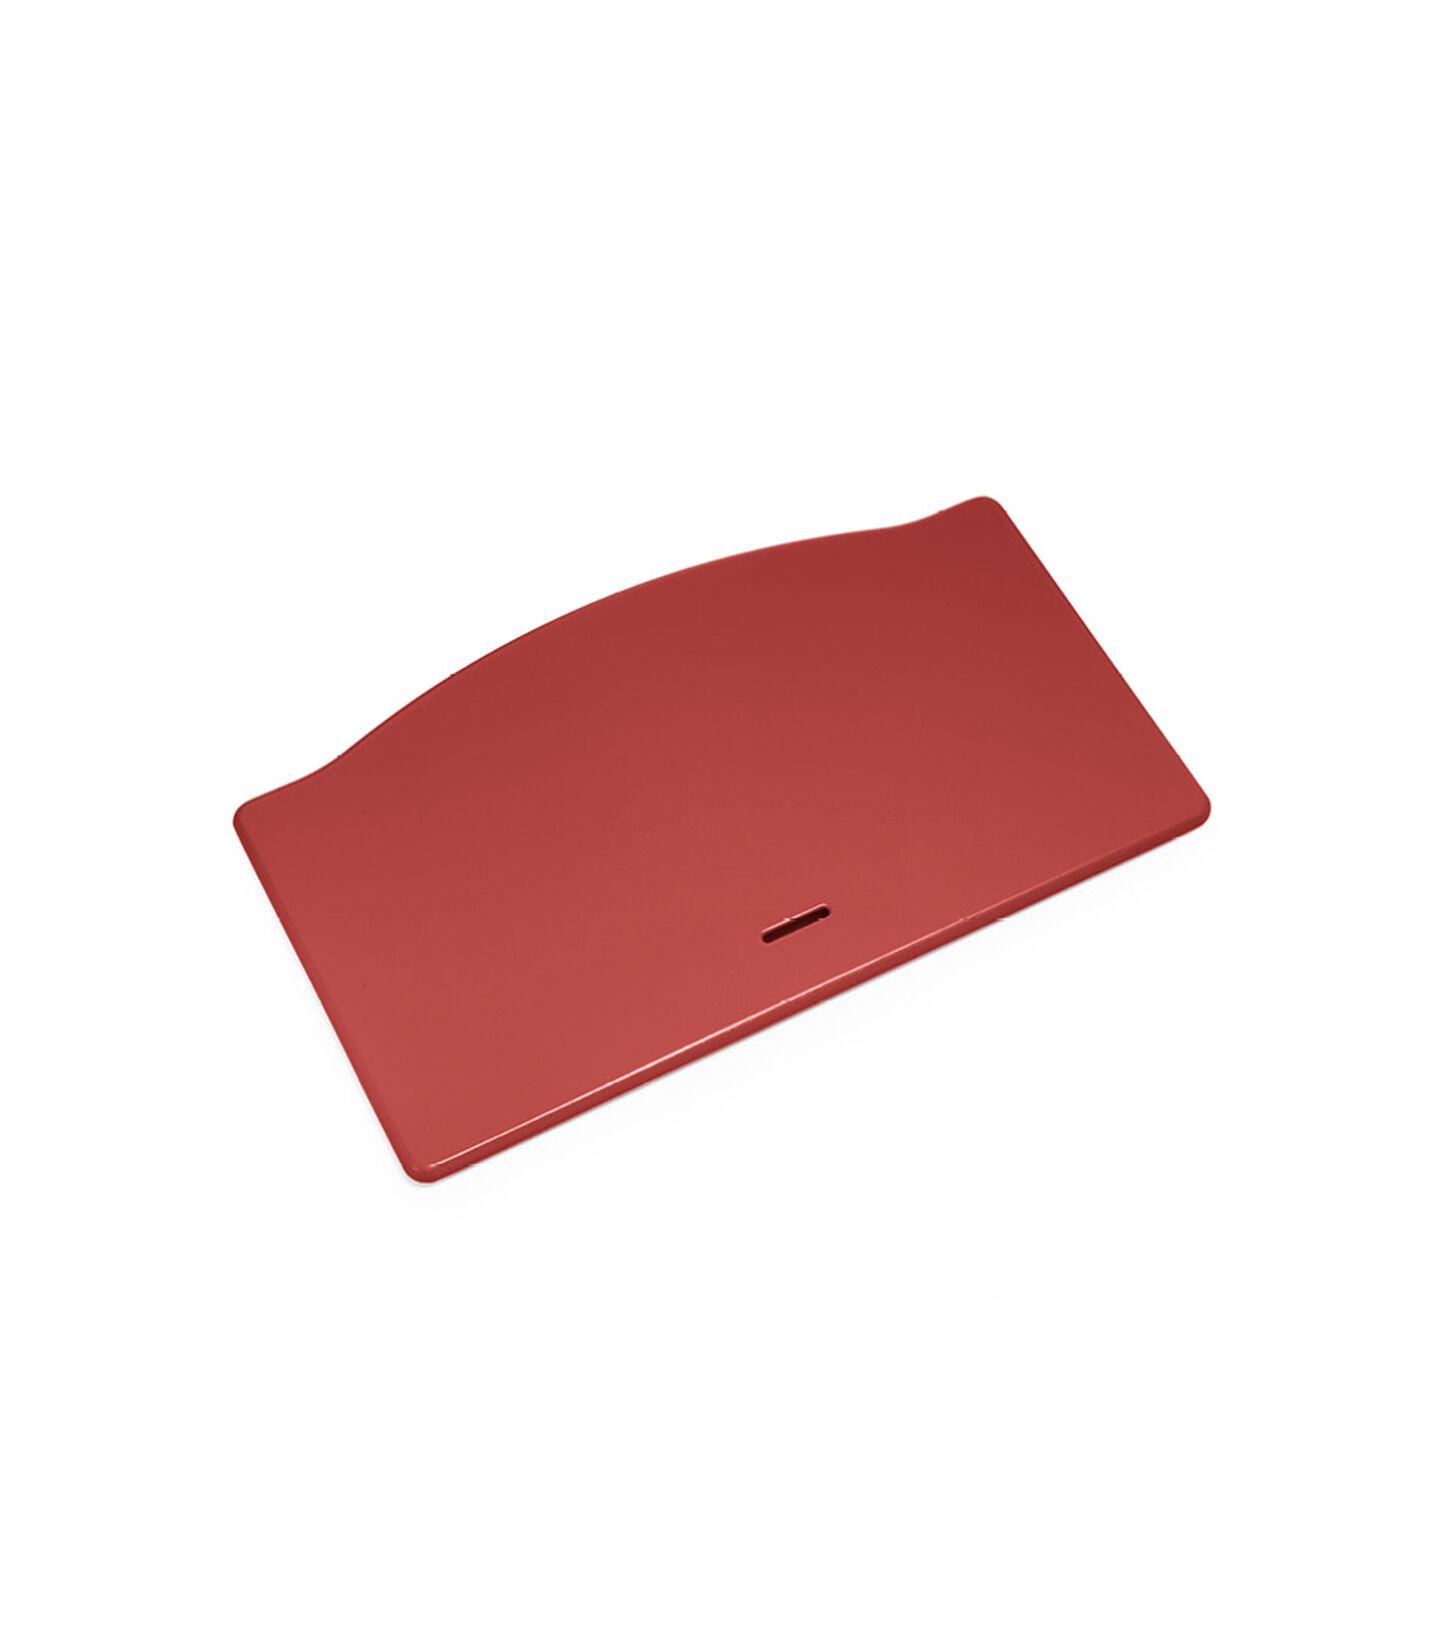 Tripp Trapp® Sitzplatte Warm Red, Warm Red, mainview view 1